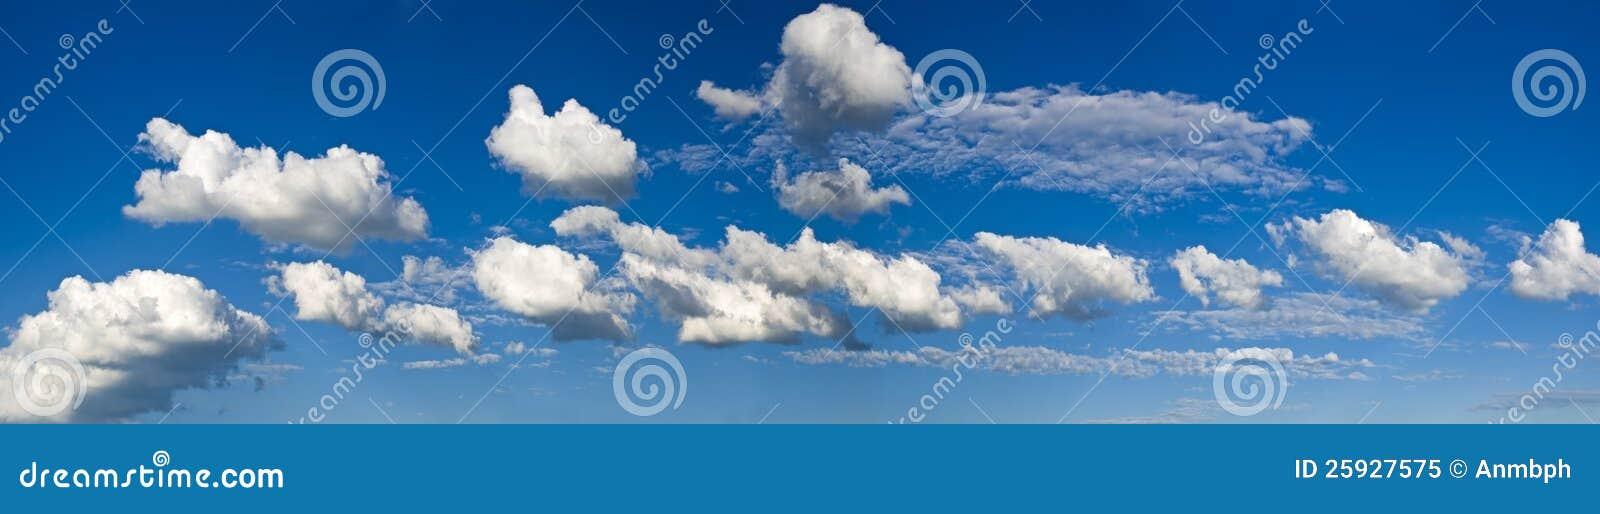 Strook van wolken